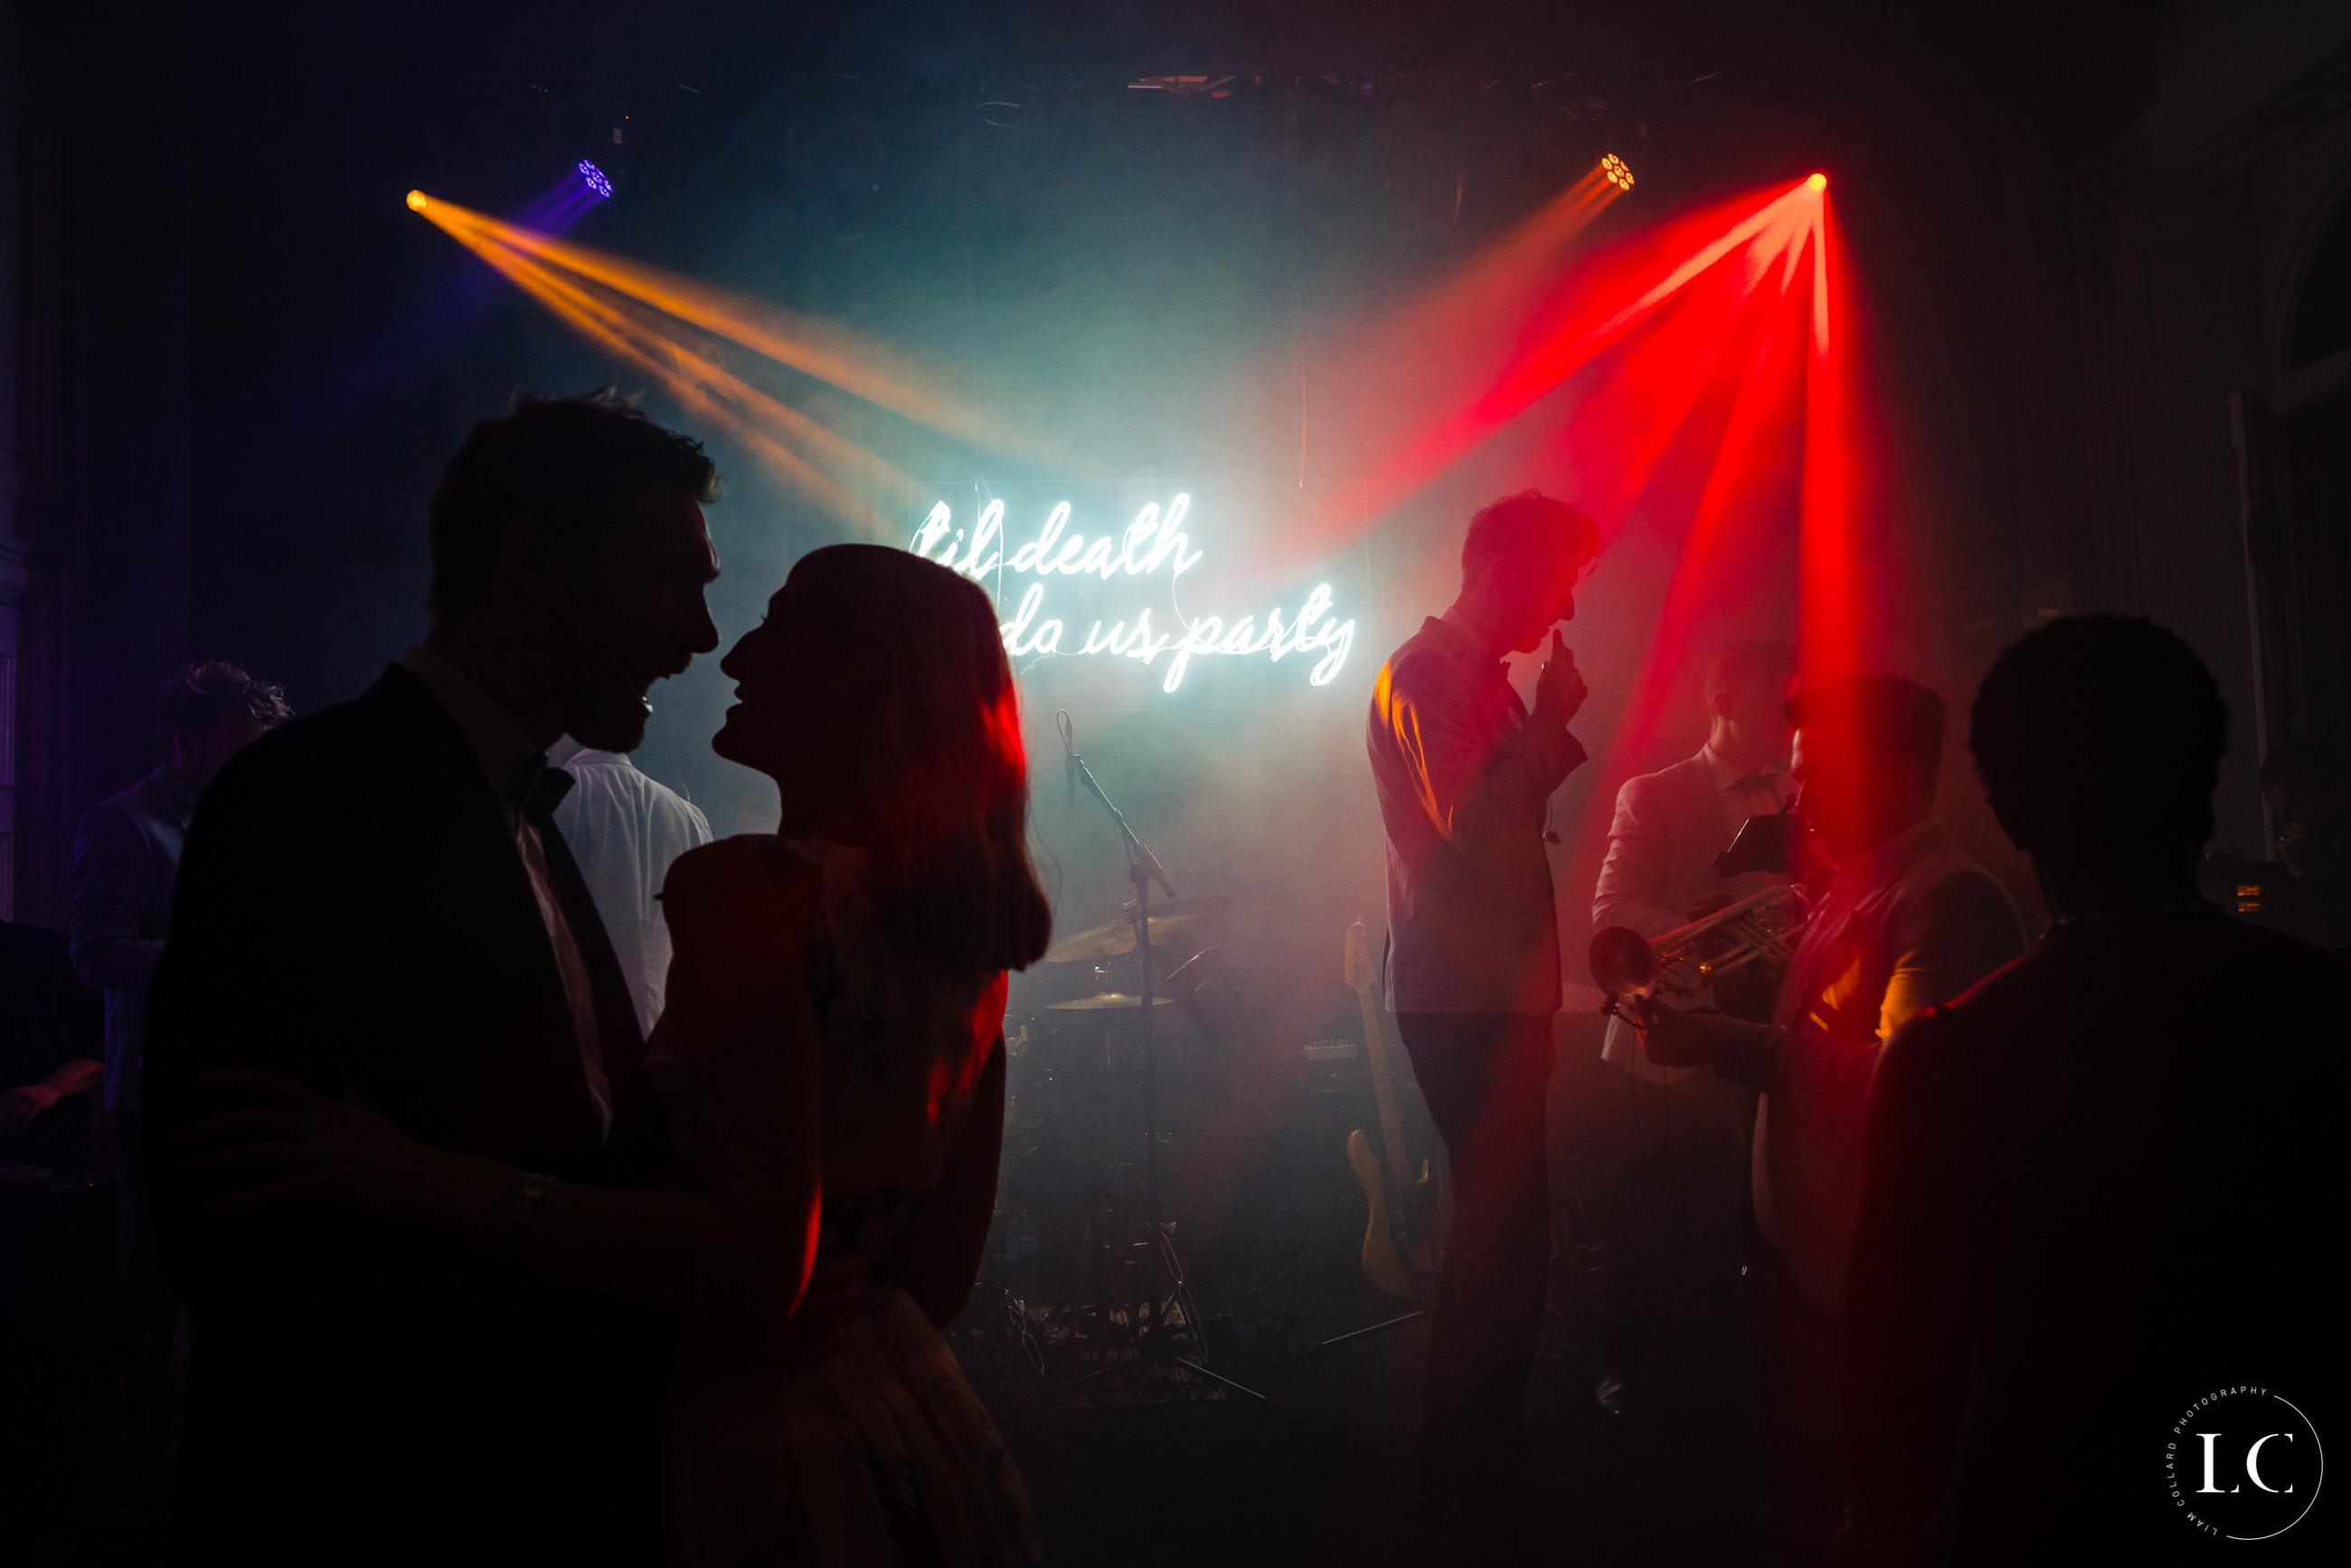 Guests dancing shadows